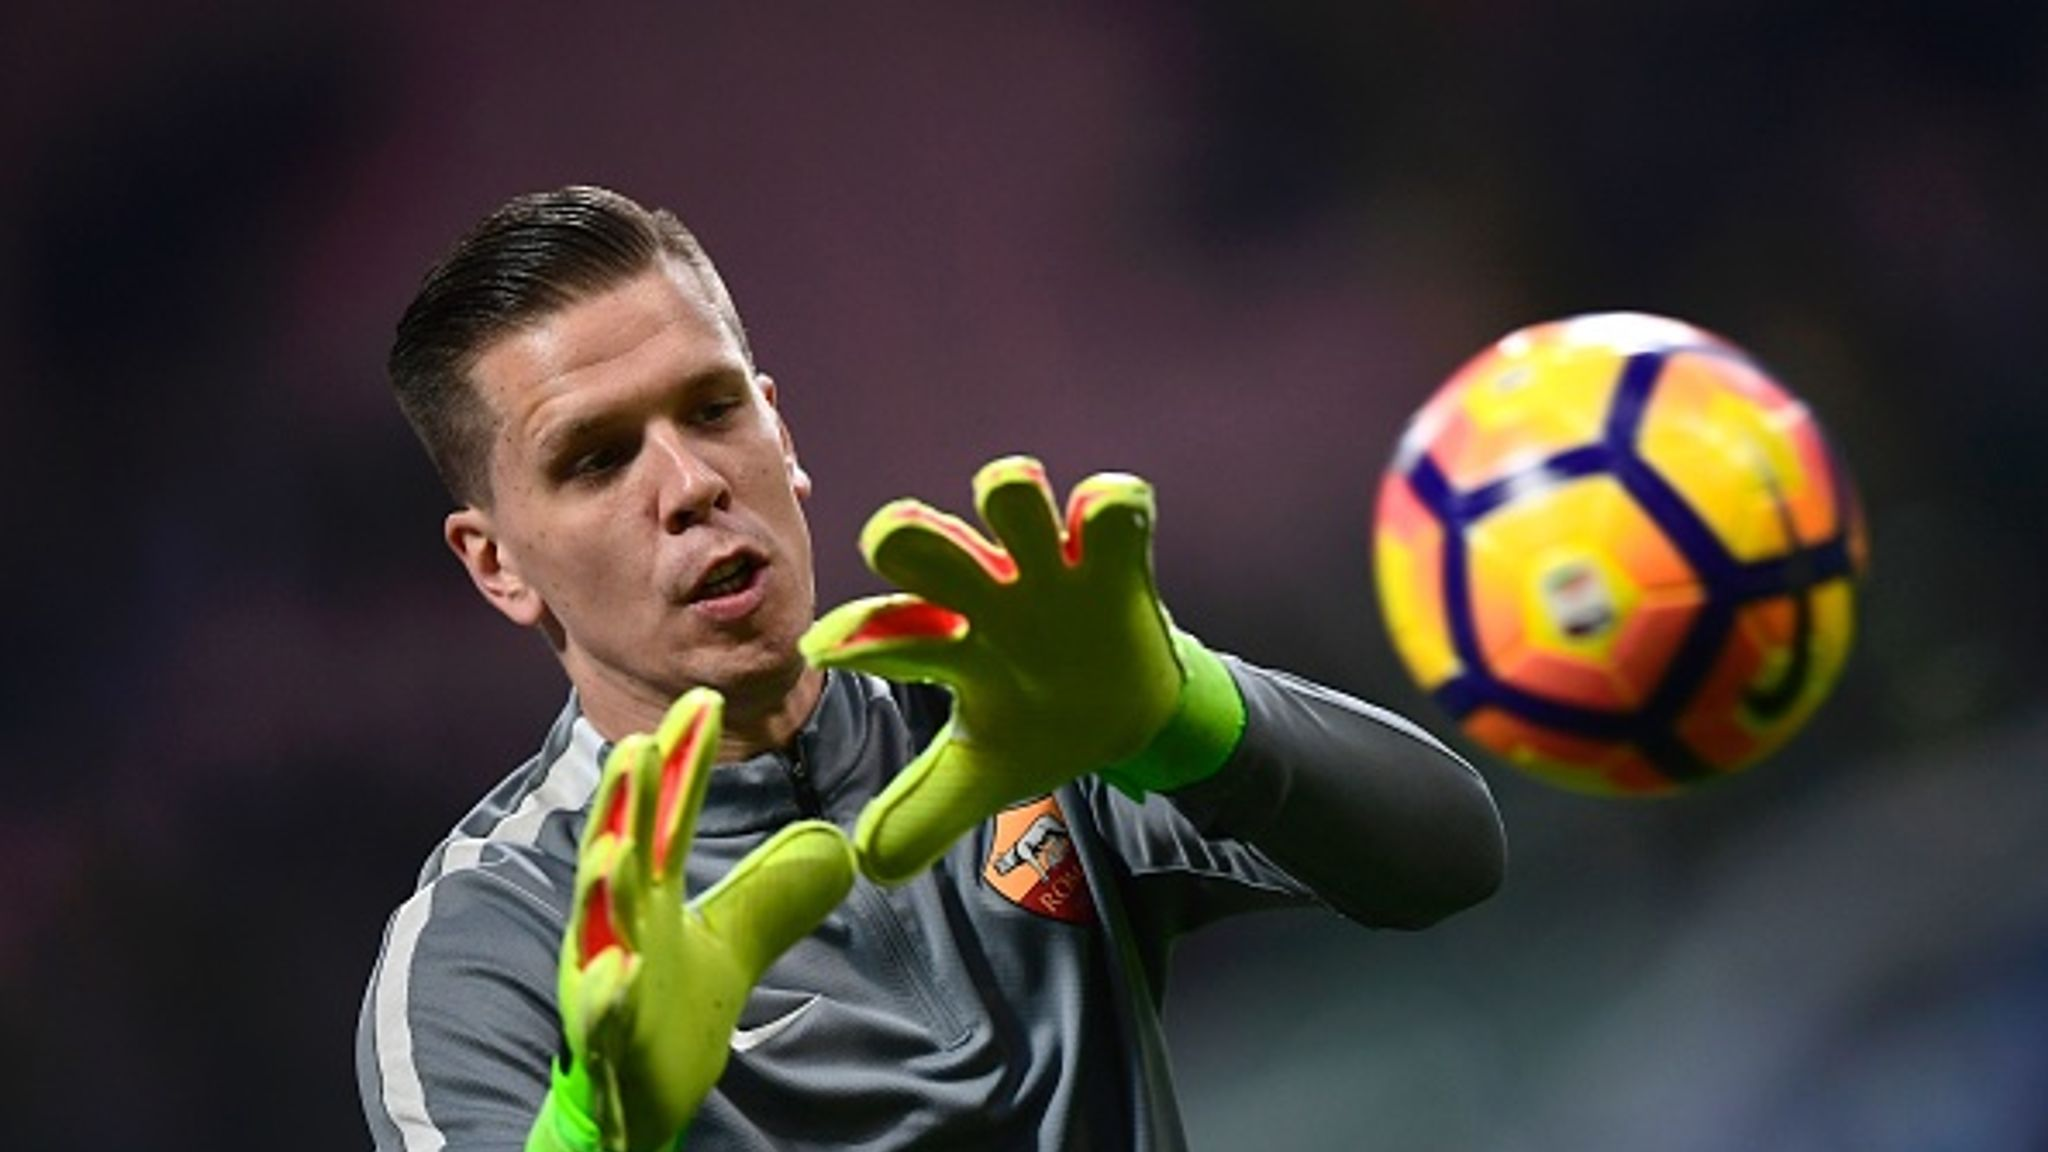 a526a8d119a Arsenal goalkeeper Wojciech Szczesny set to join Juventus | Football ...